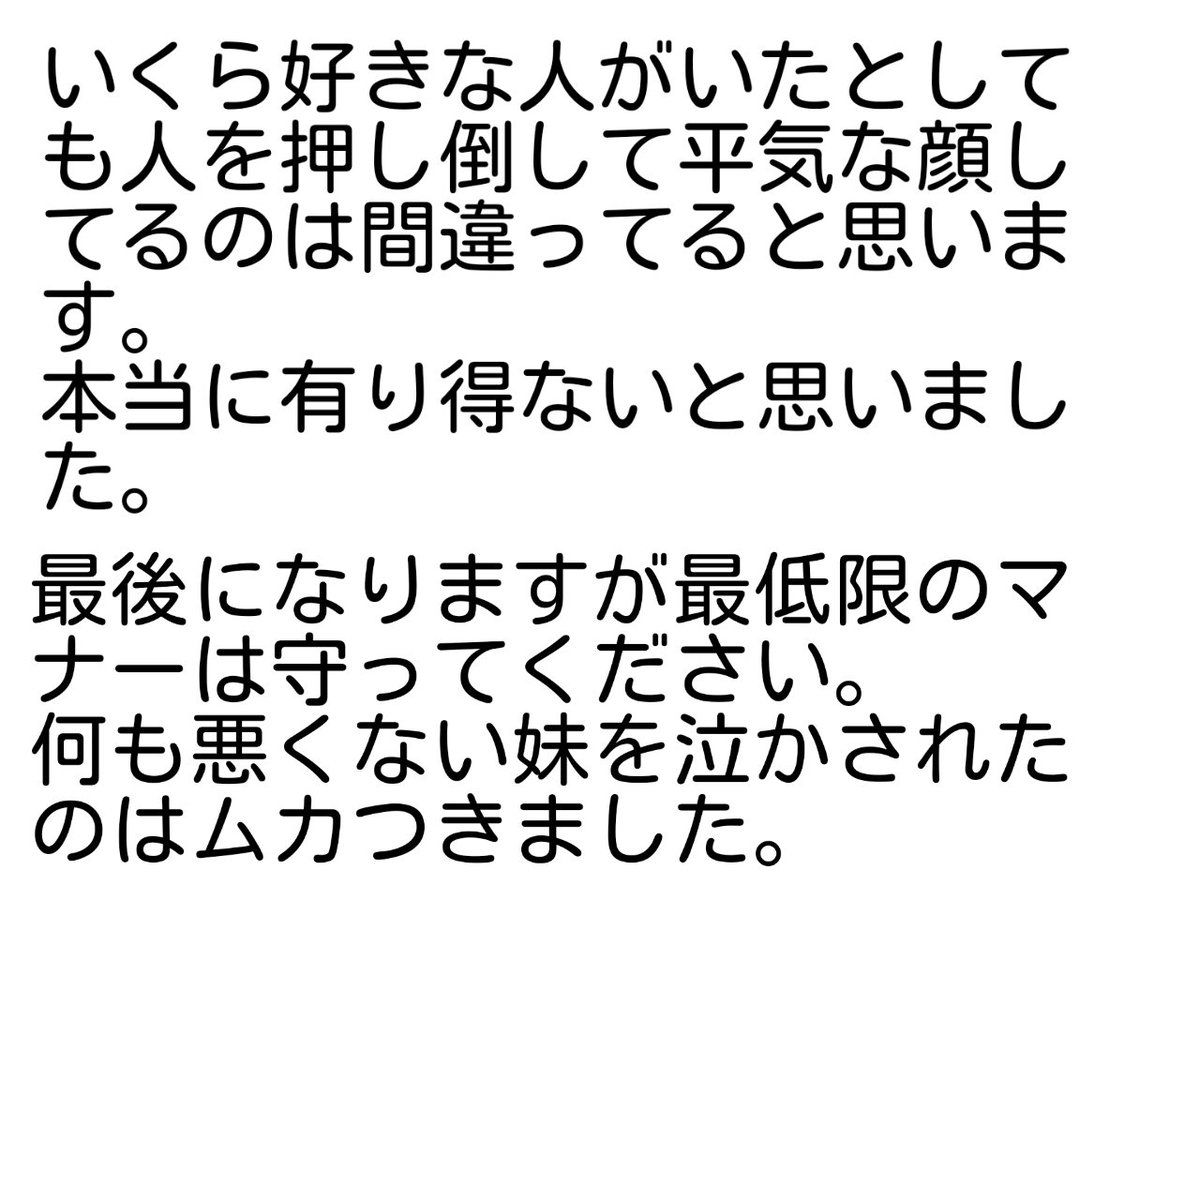 DoBLFTpVsAIRHAi4.jpg